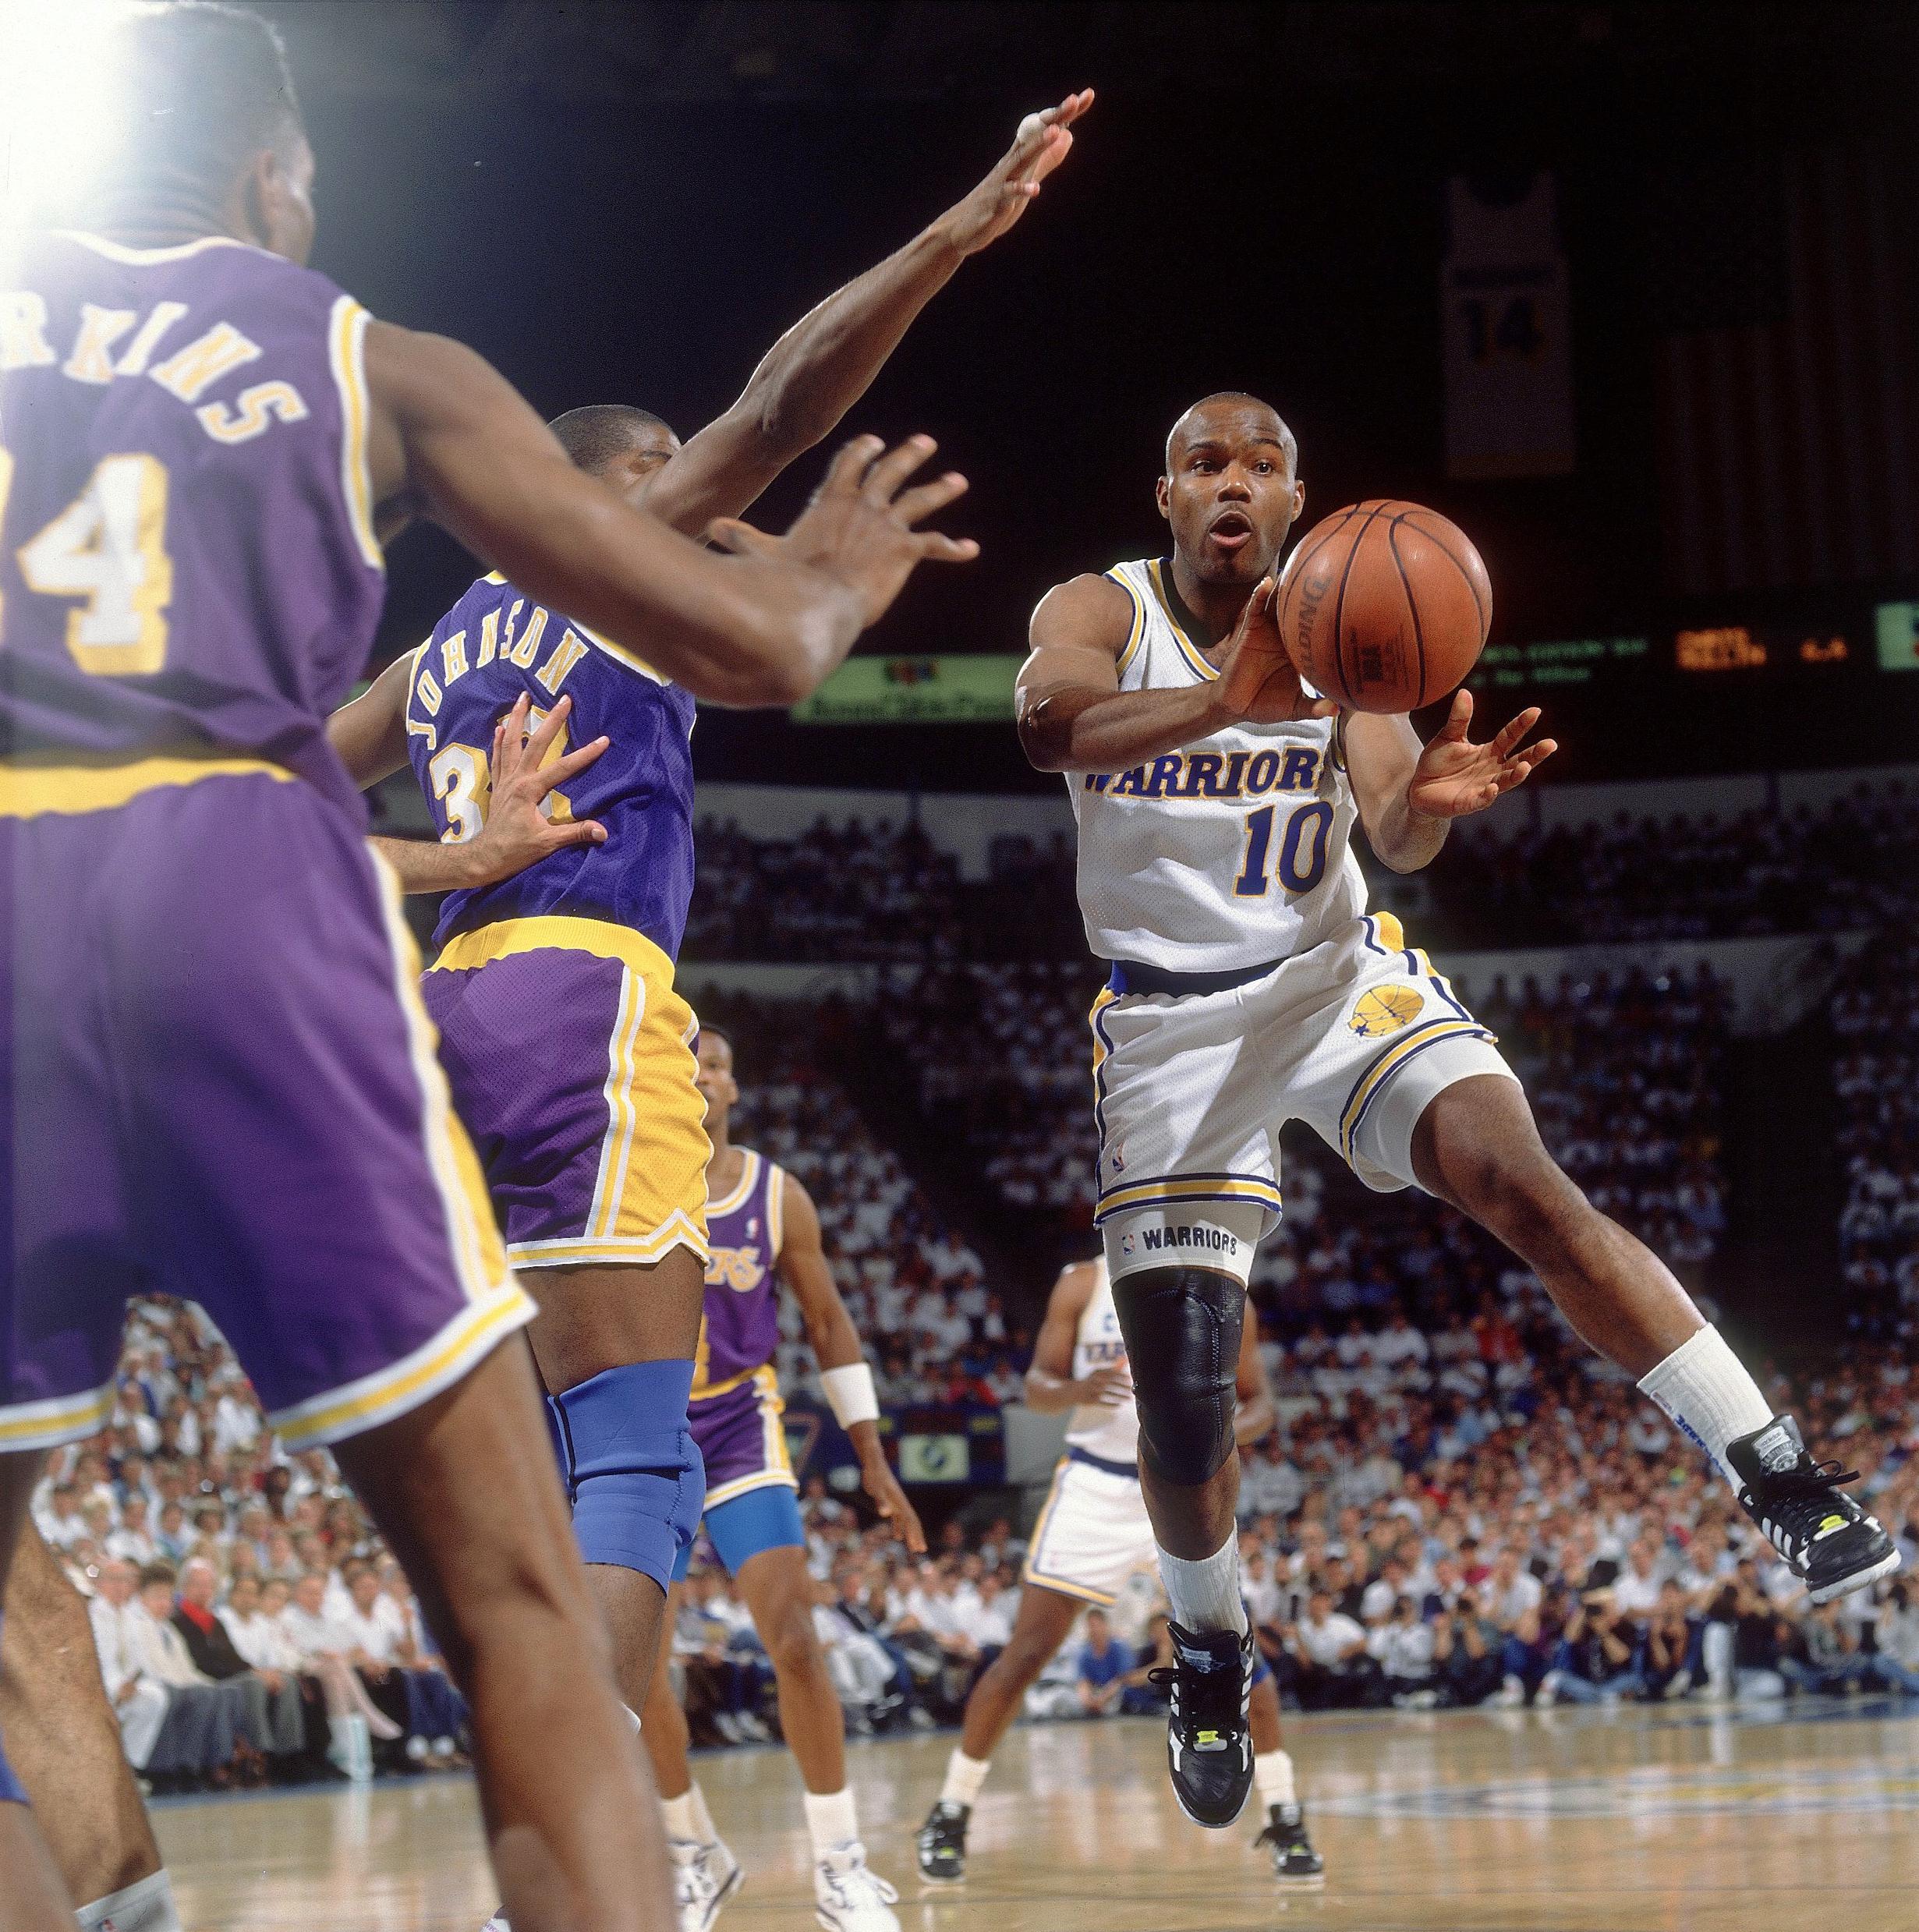 Nba: NBA Images